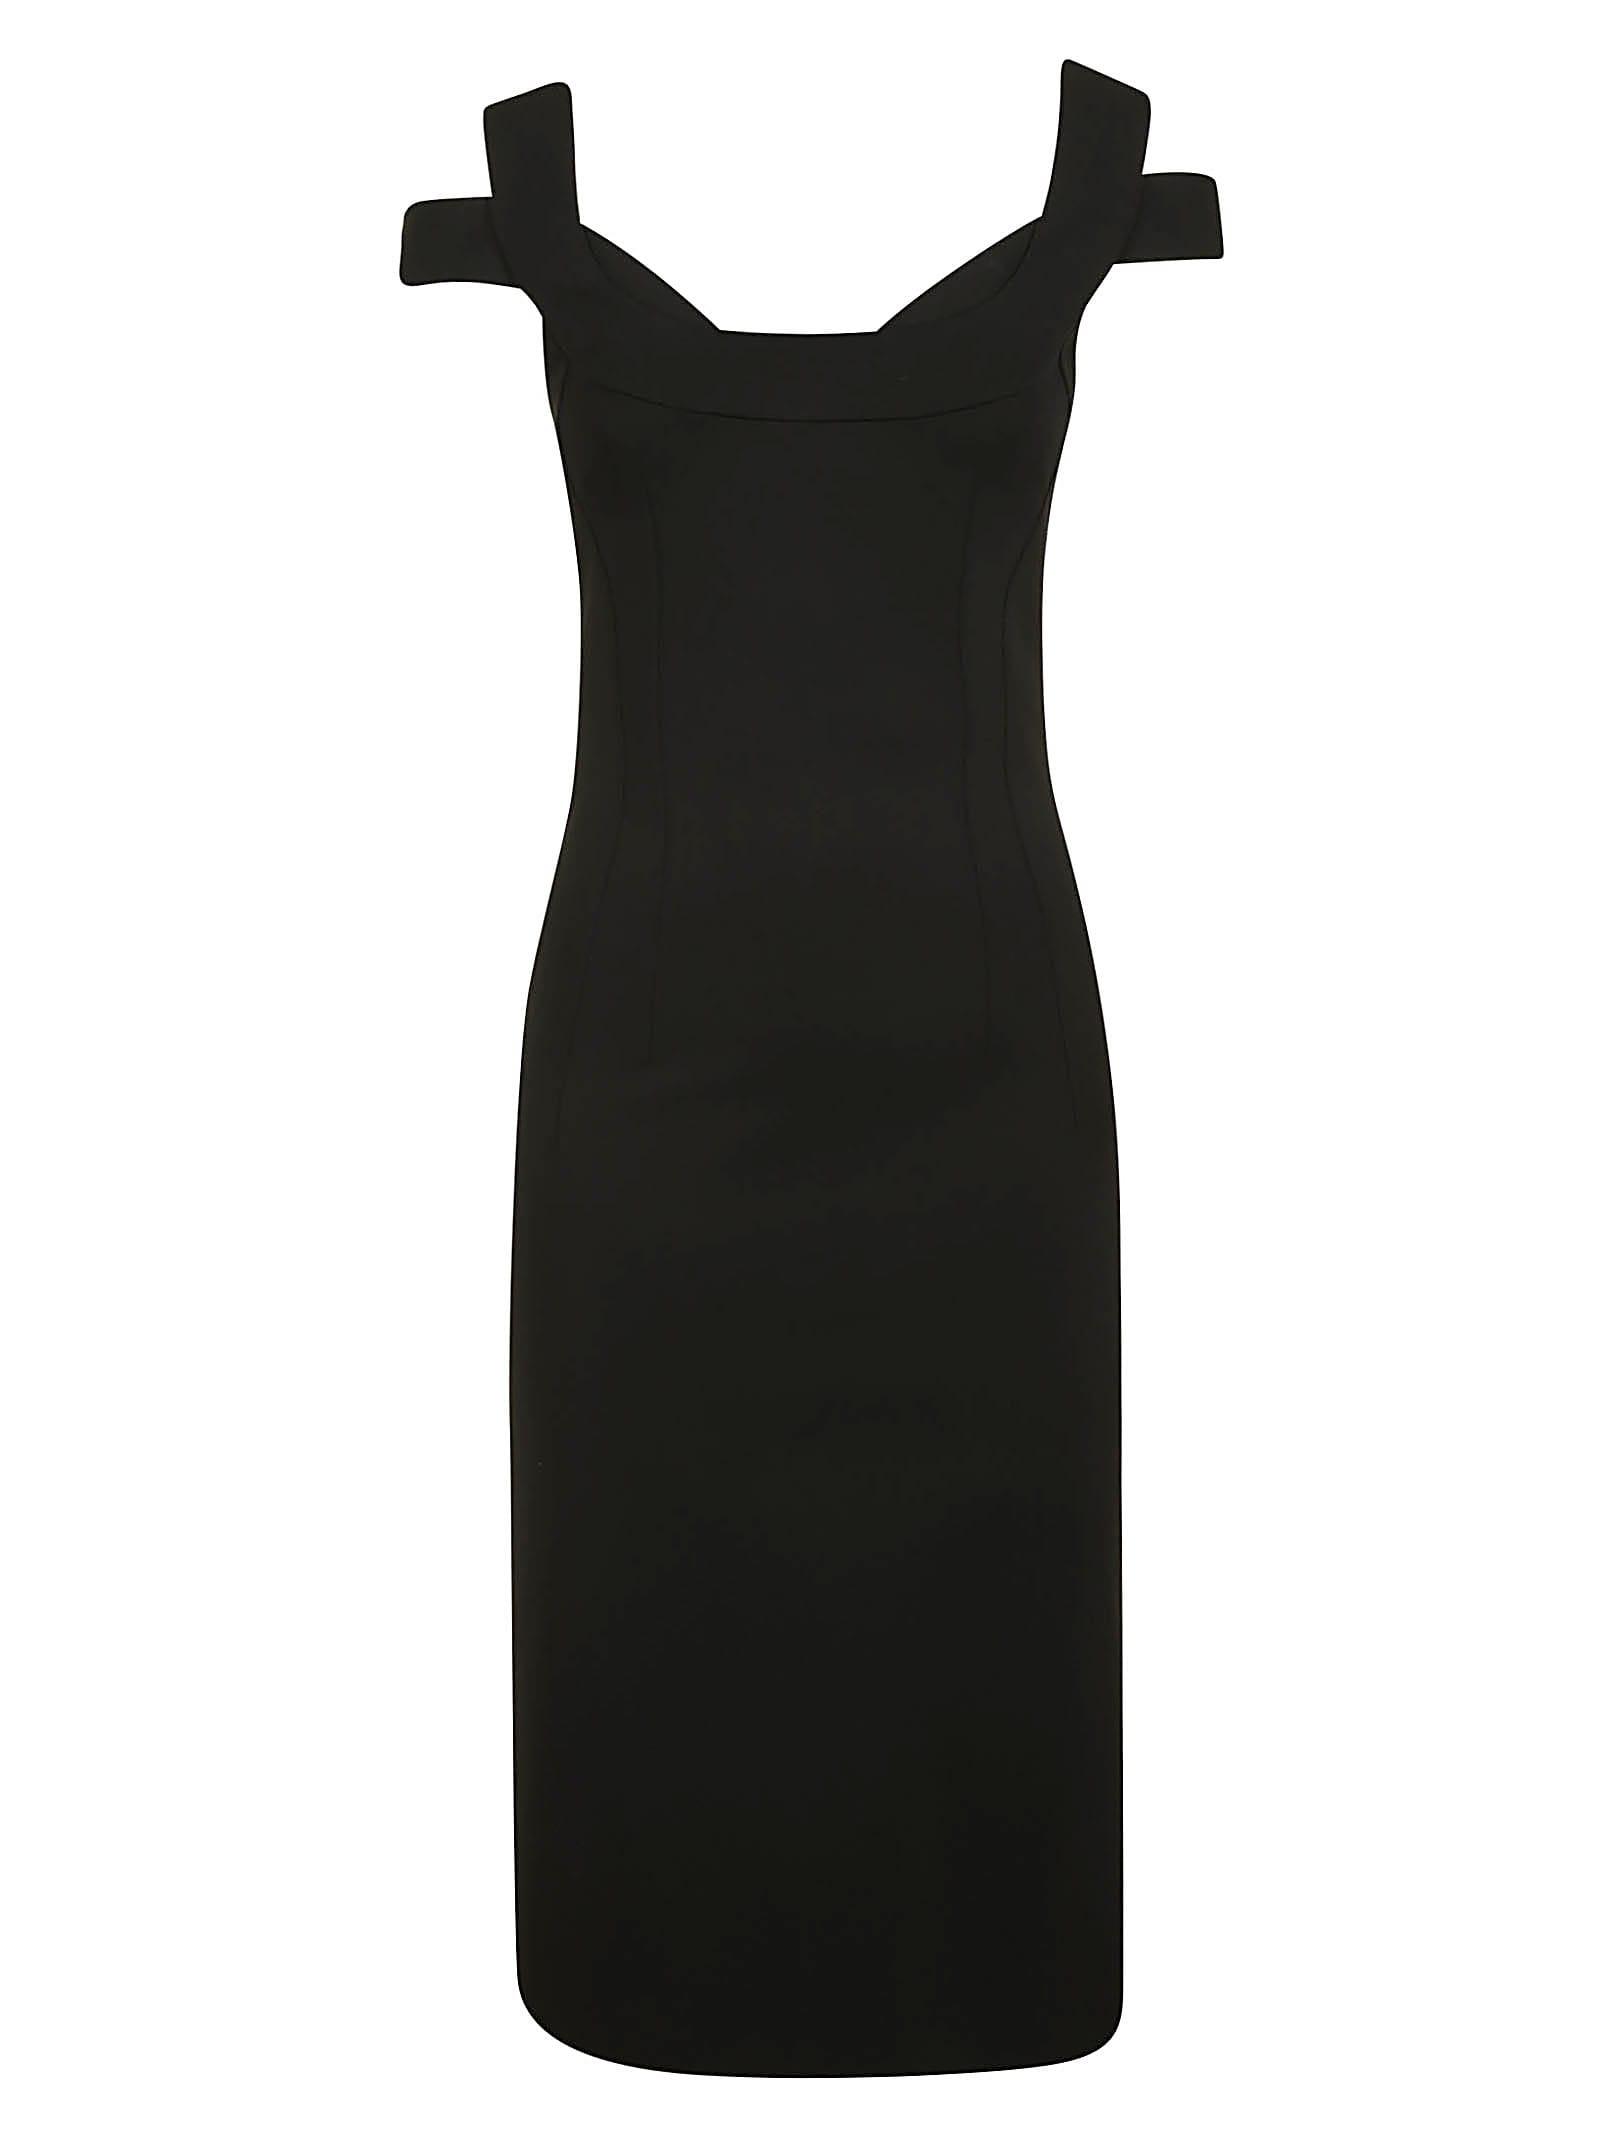 Buy Dolce & Gabbana Rear Zip Dress online, shop Dolce & Gabbana with free shipping